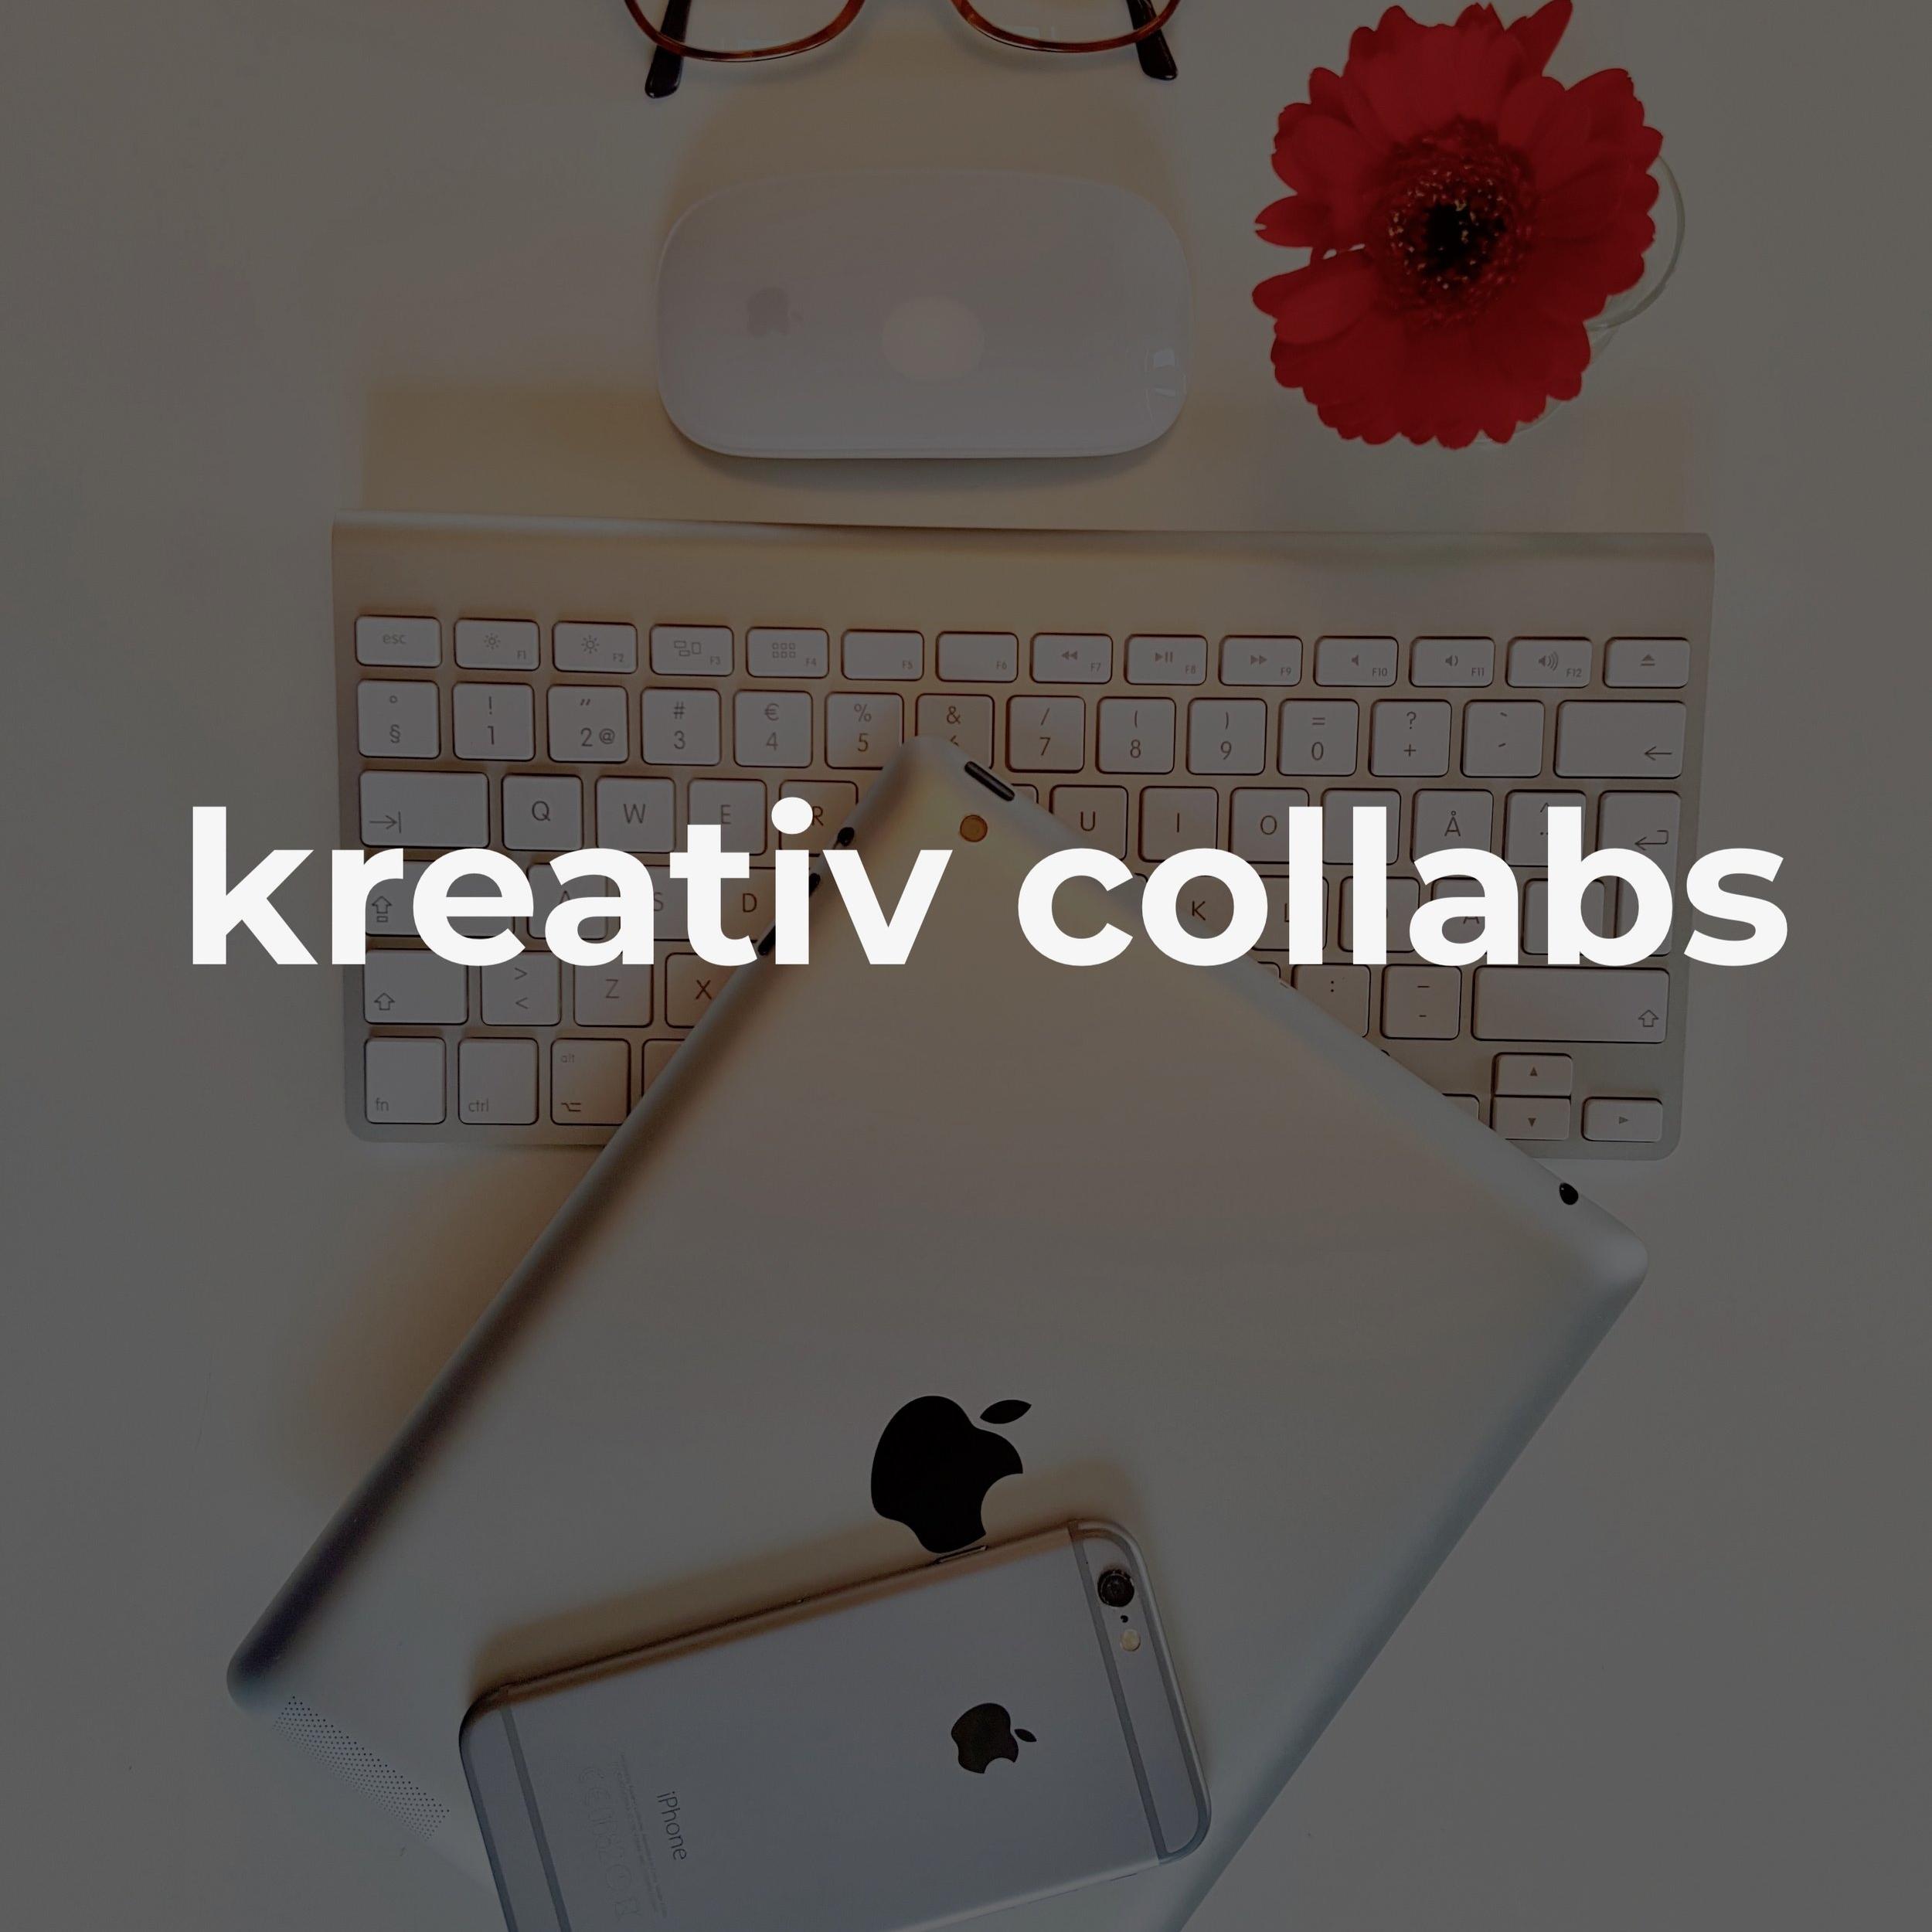 kreativ collabs.jpg